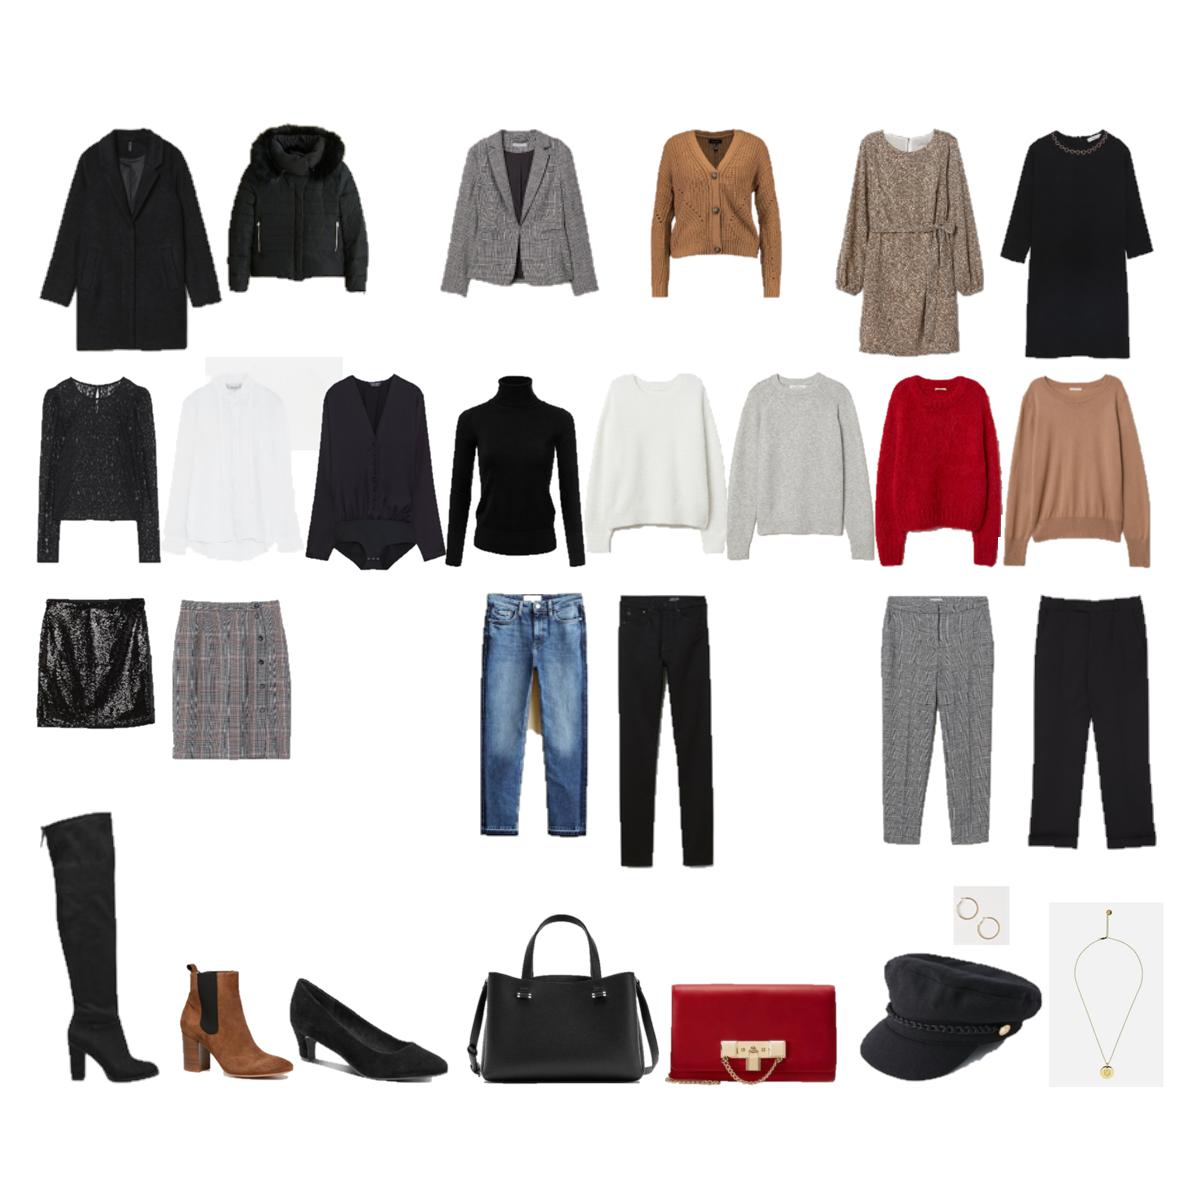 Winter Capsule Wardrobe 2019